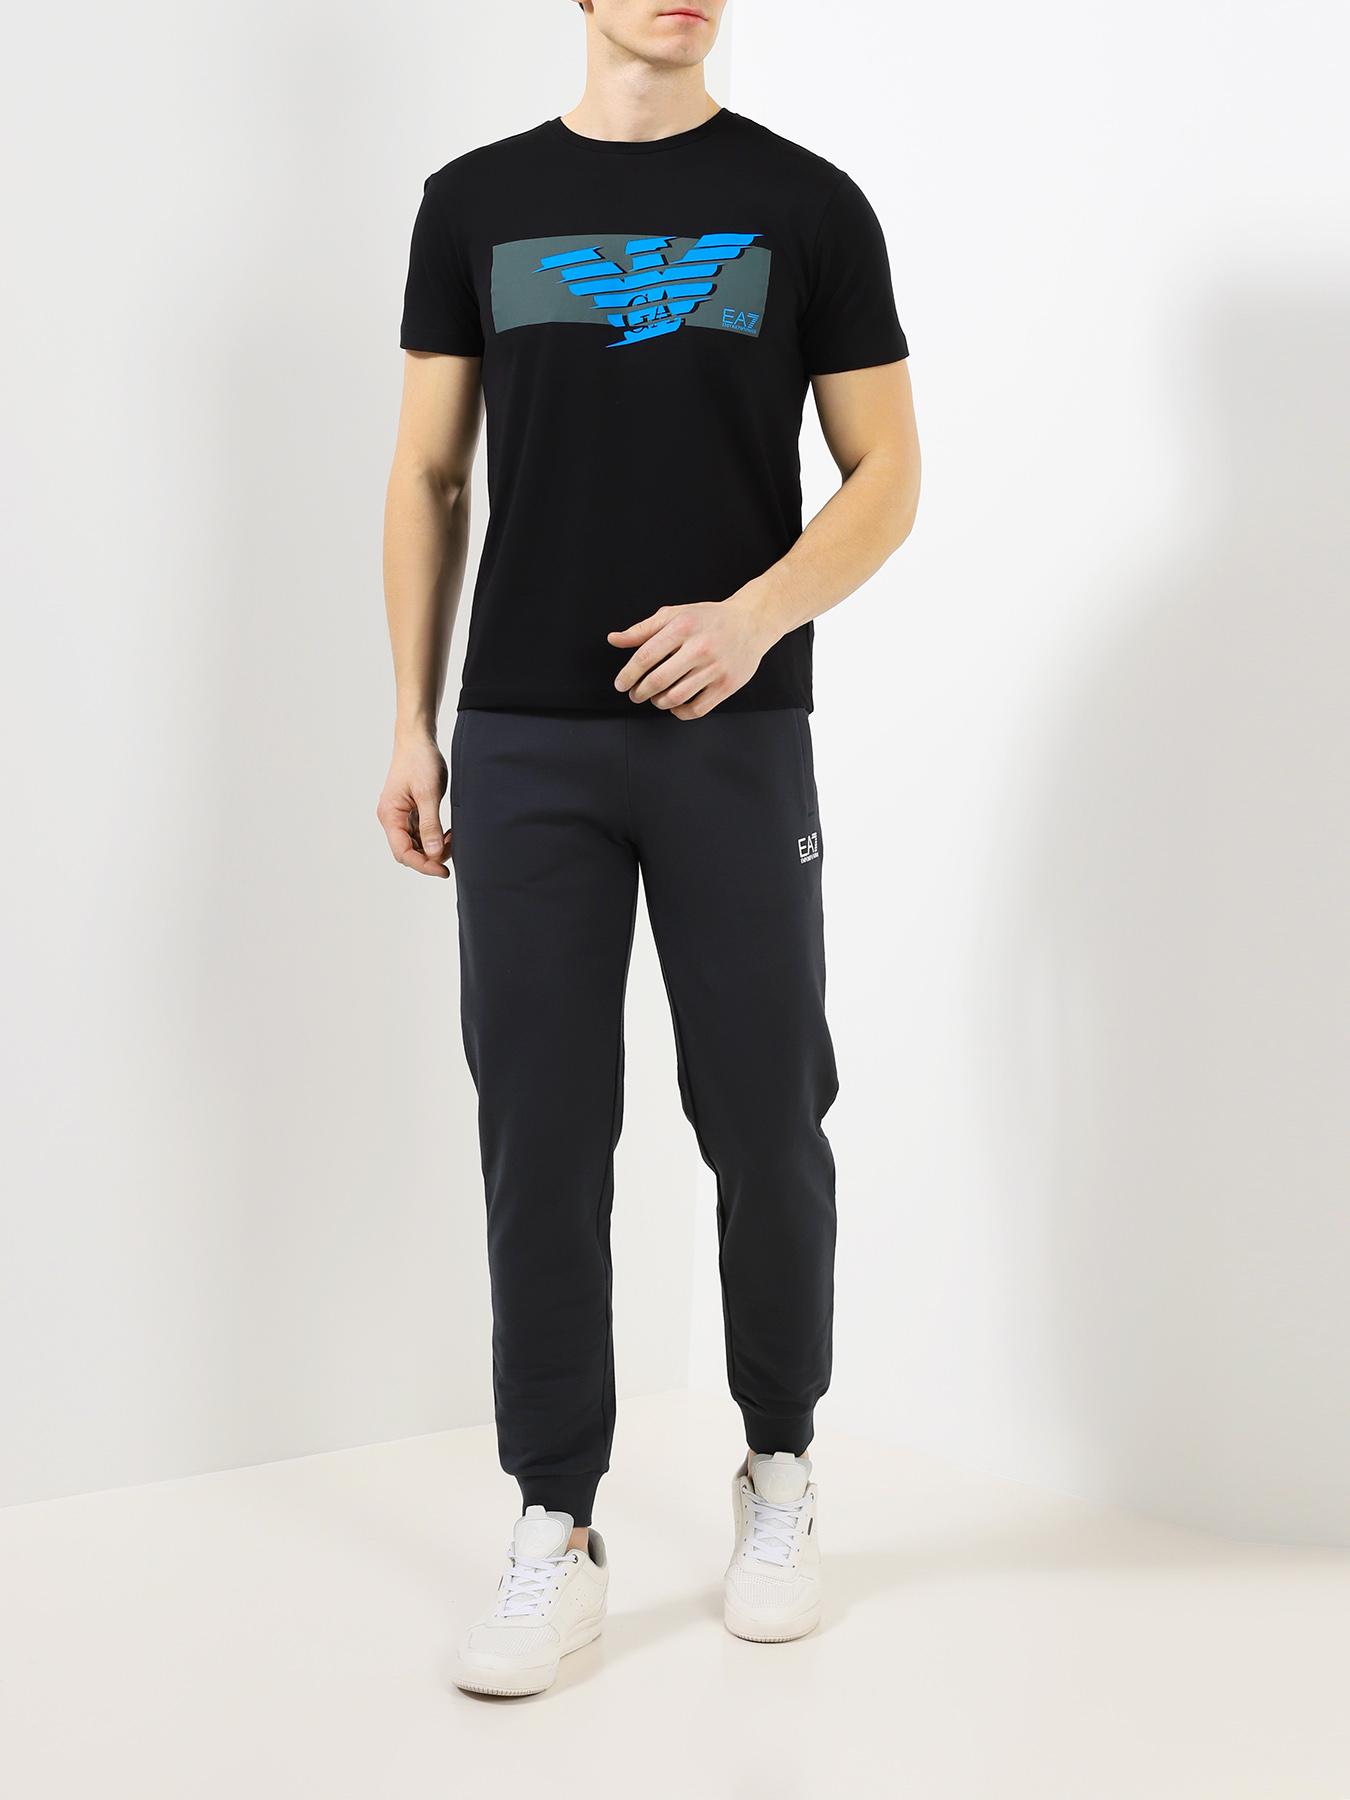 Брюки EA7 Emporio Armani Спортивные брюки брюки спортивные ea7 ea7 ea002ewzuh10